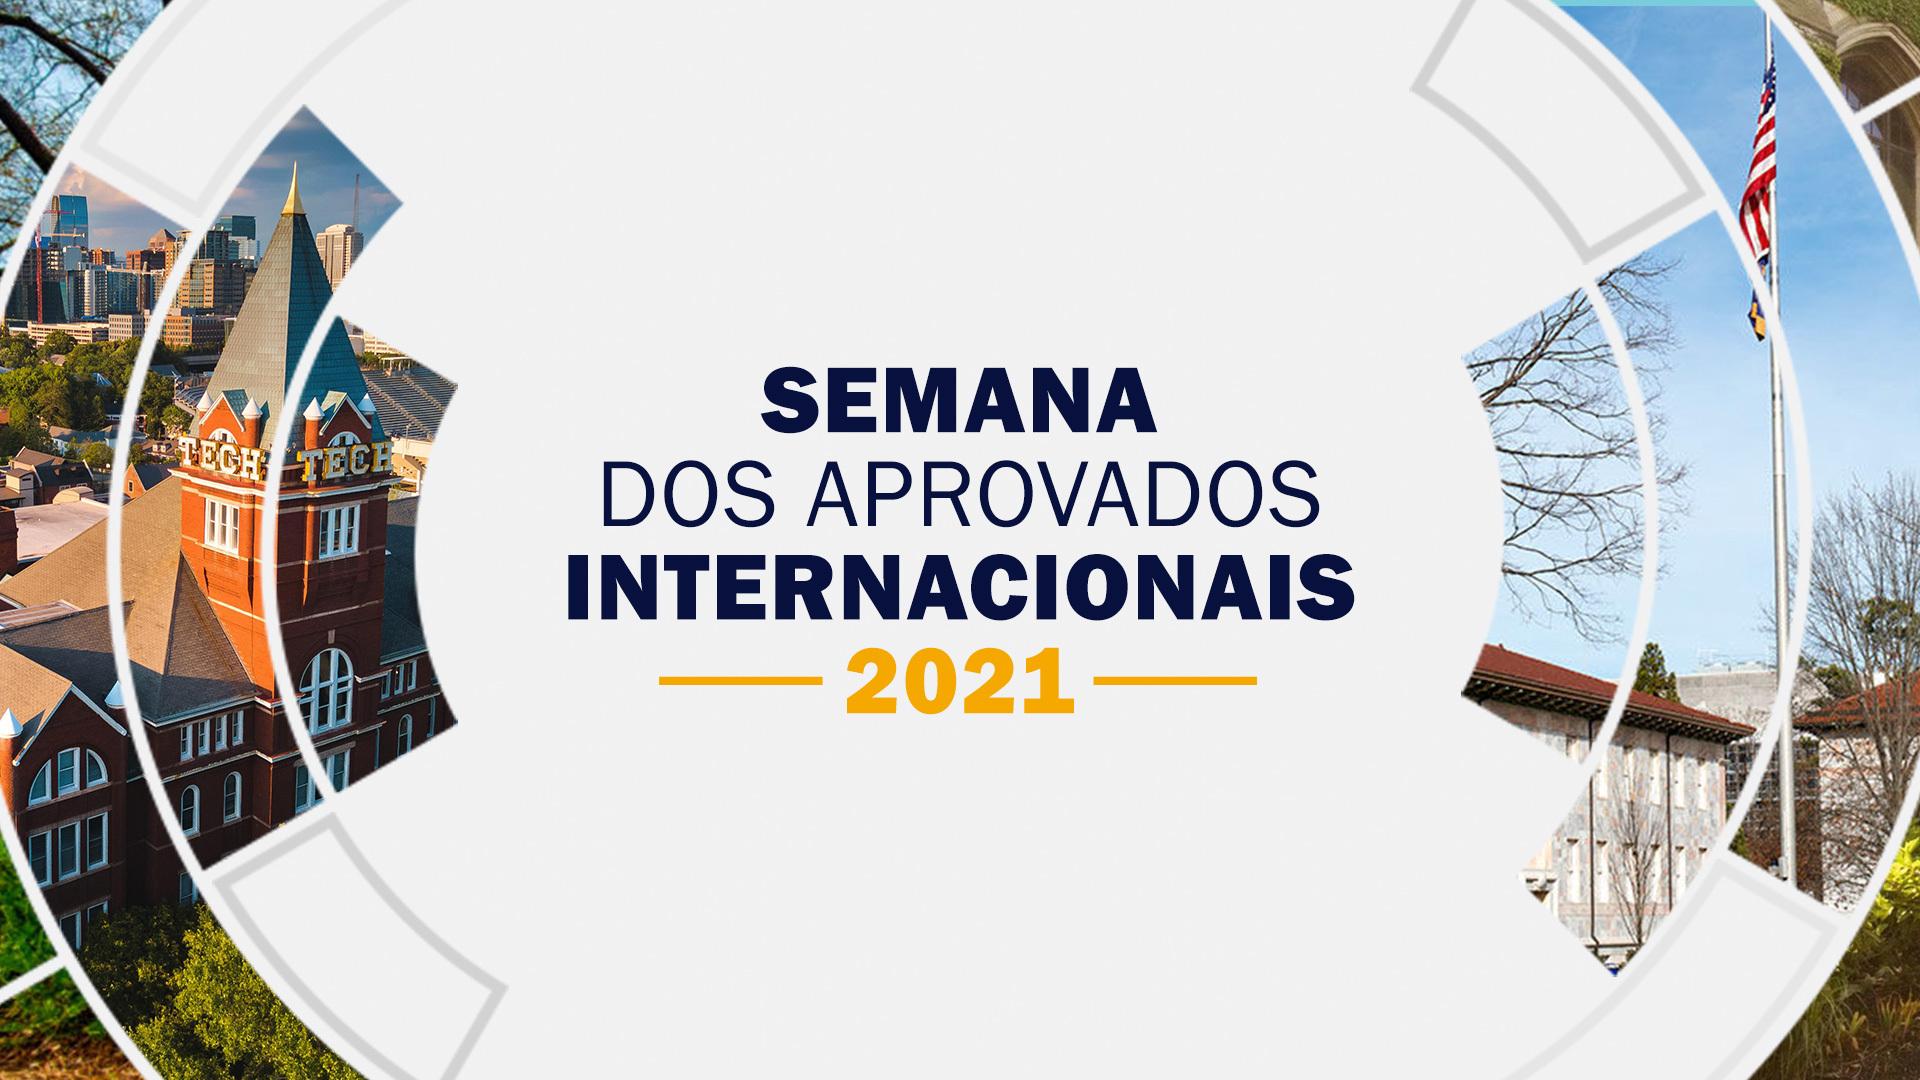 Confira os principais destaques da Semana dos Aprovados Internacionais 2021.